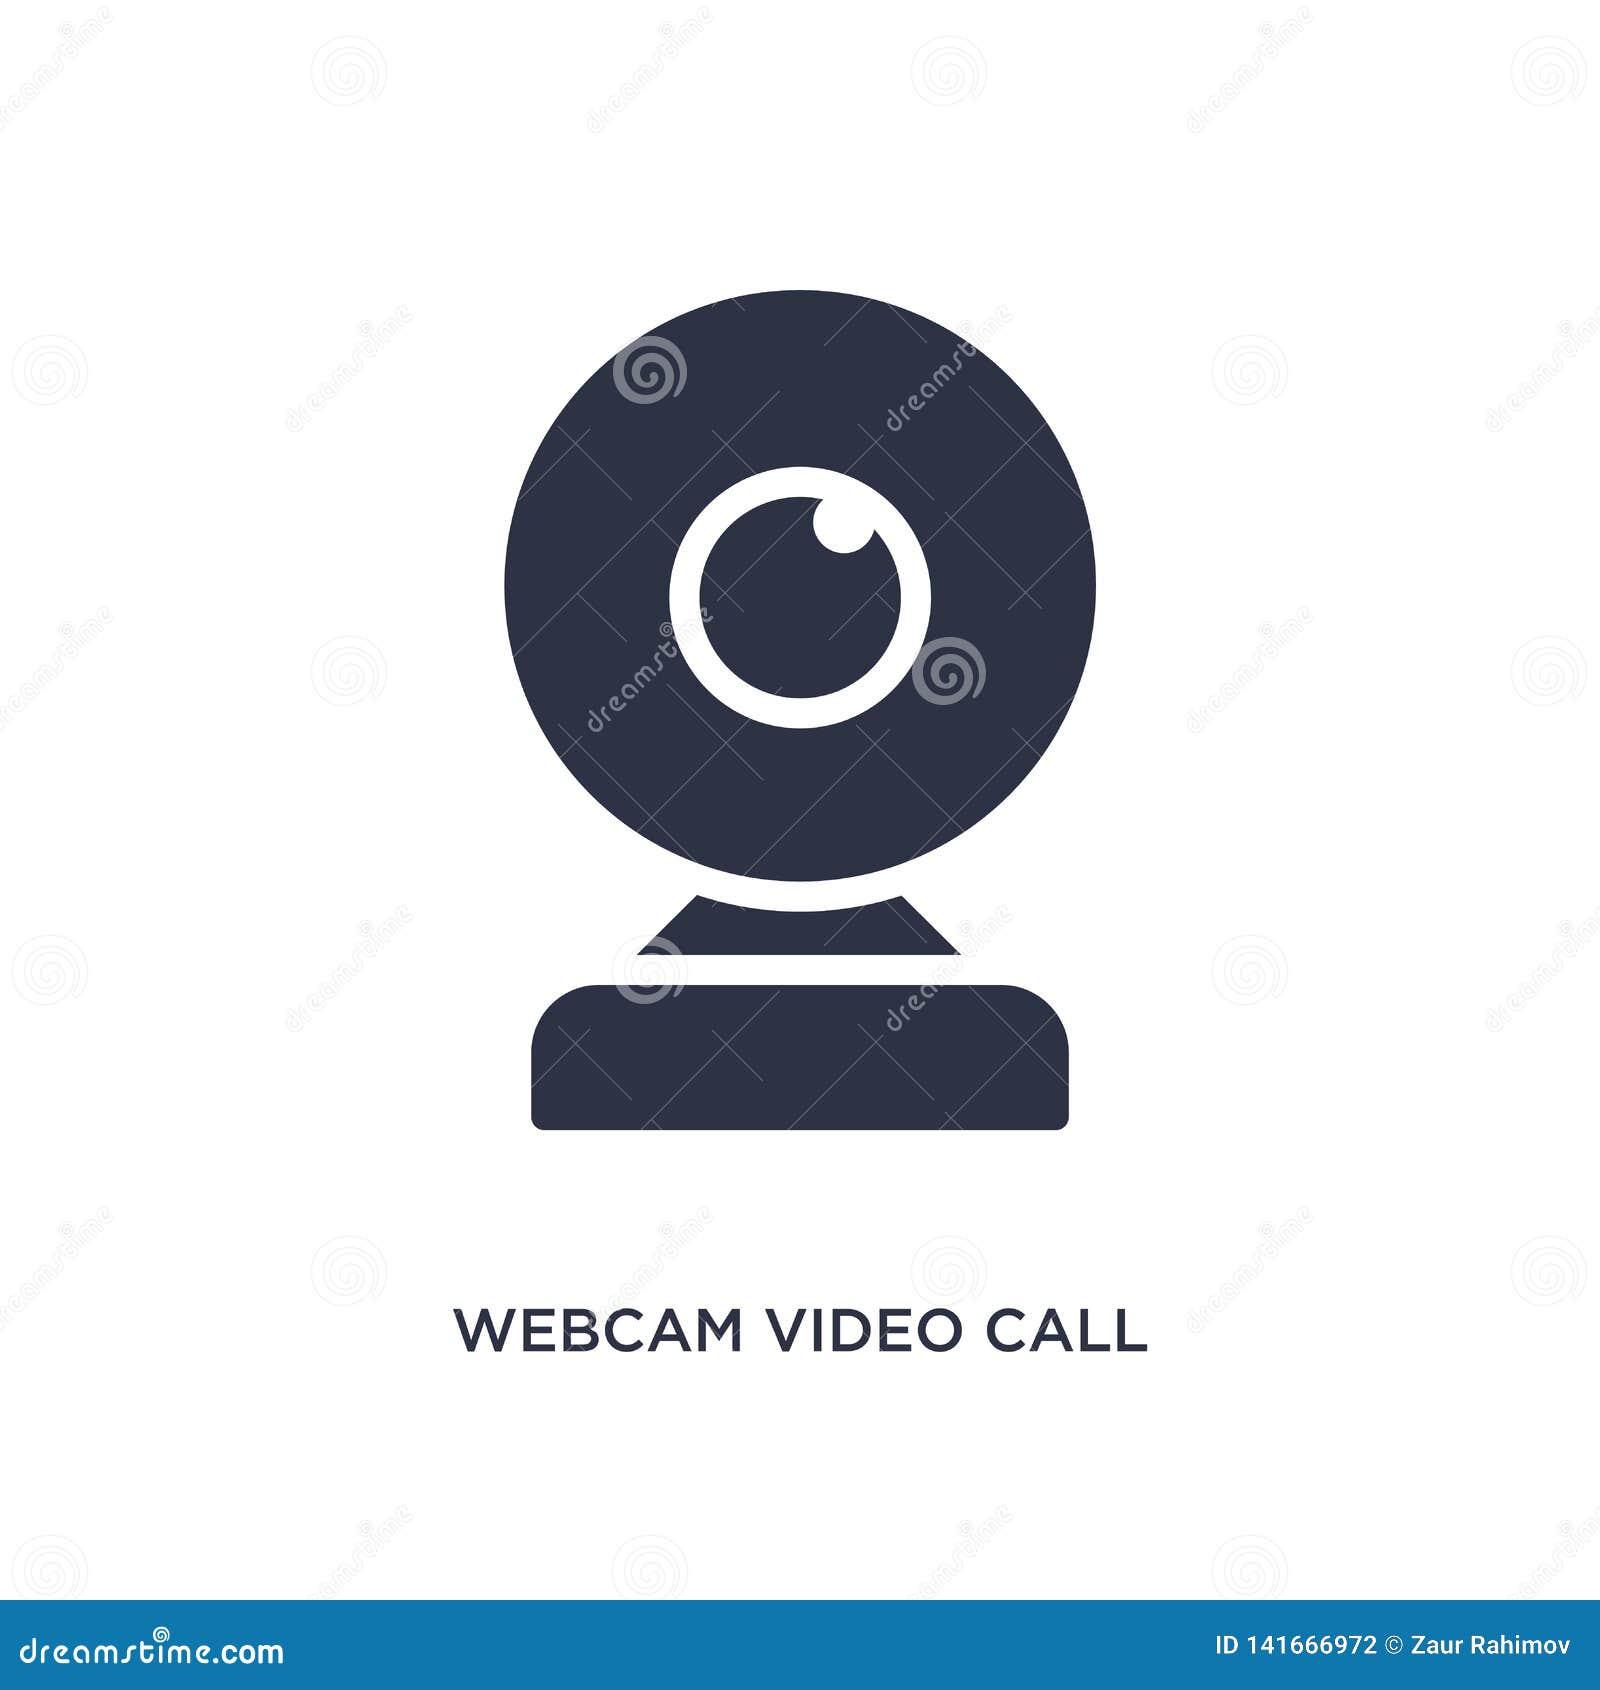 Webcam τηλεοπτικό εικονίδιο κλήσης στο άσπρο υπόβαθρο Απλή απεικόνιση στοιχείων από τη μουσική και την έννοια μέσων